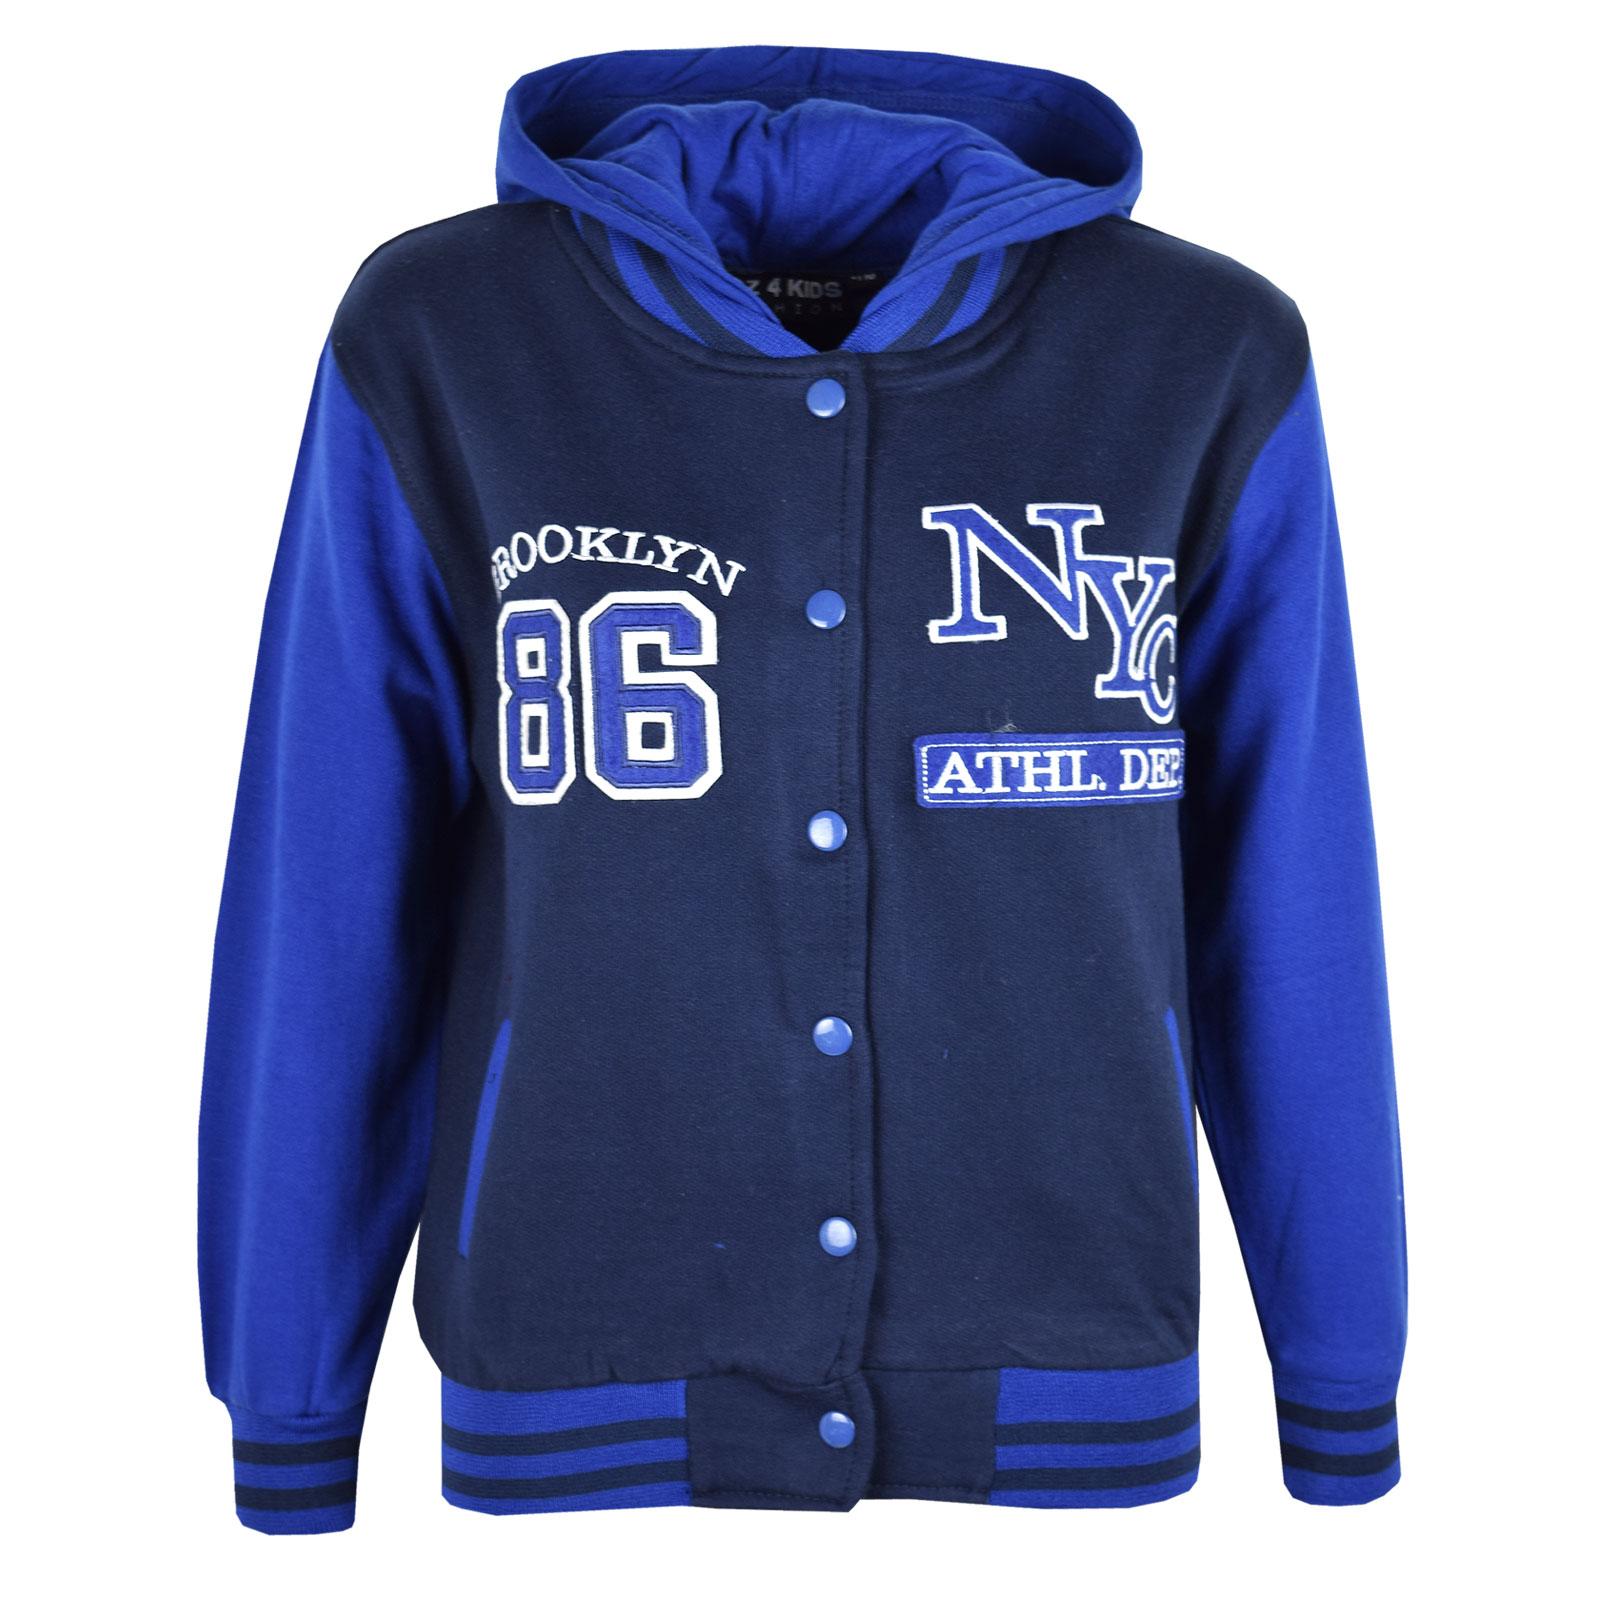 kids girls boys baseball jacket varsity style plain school jackets top year see more like this JH Design - MLB Kids Reversible Varsity / Baseball Style Jacket - Oakland A's Brand New.